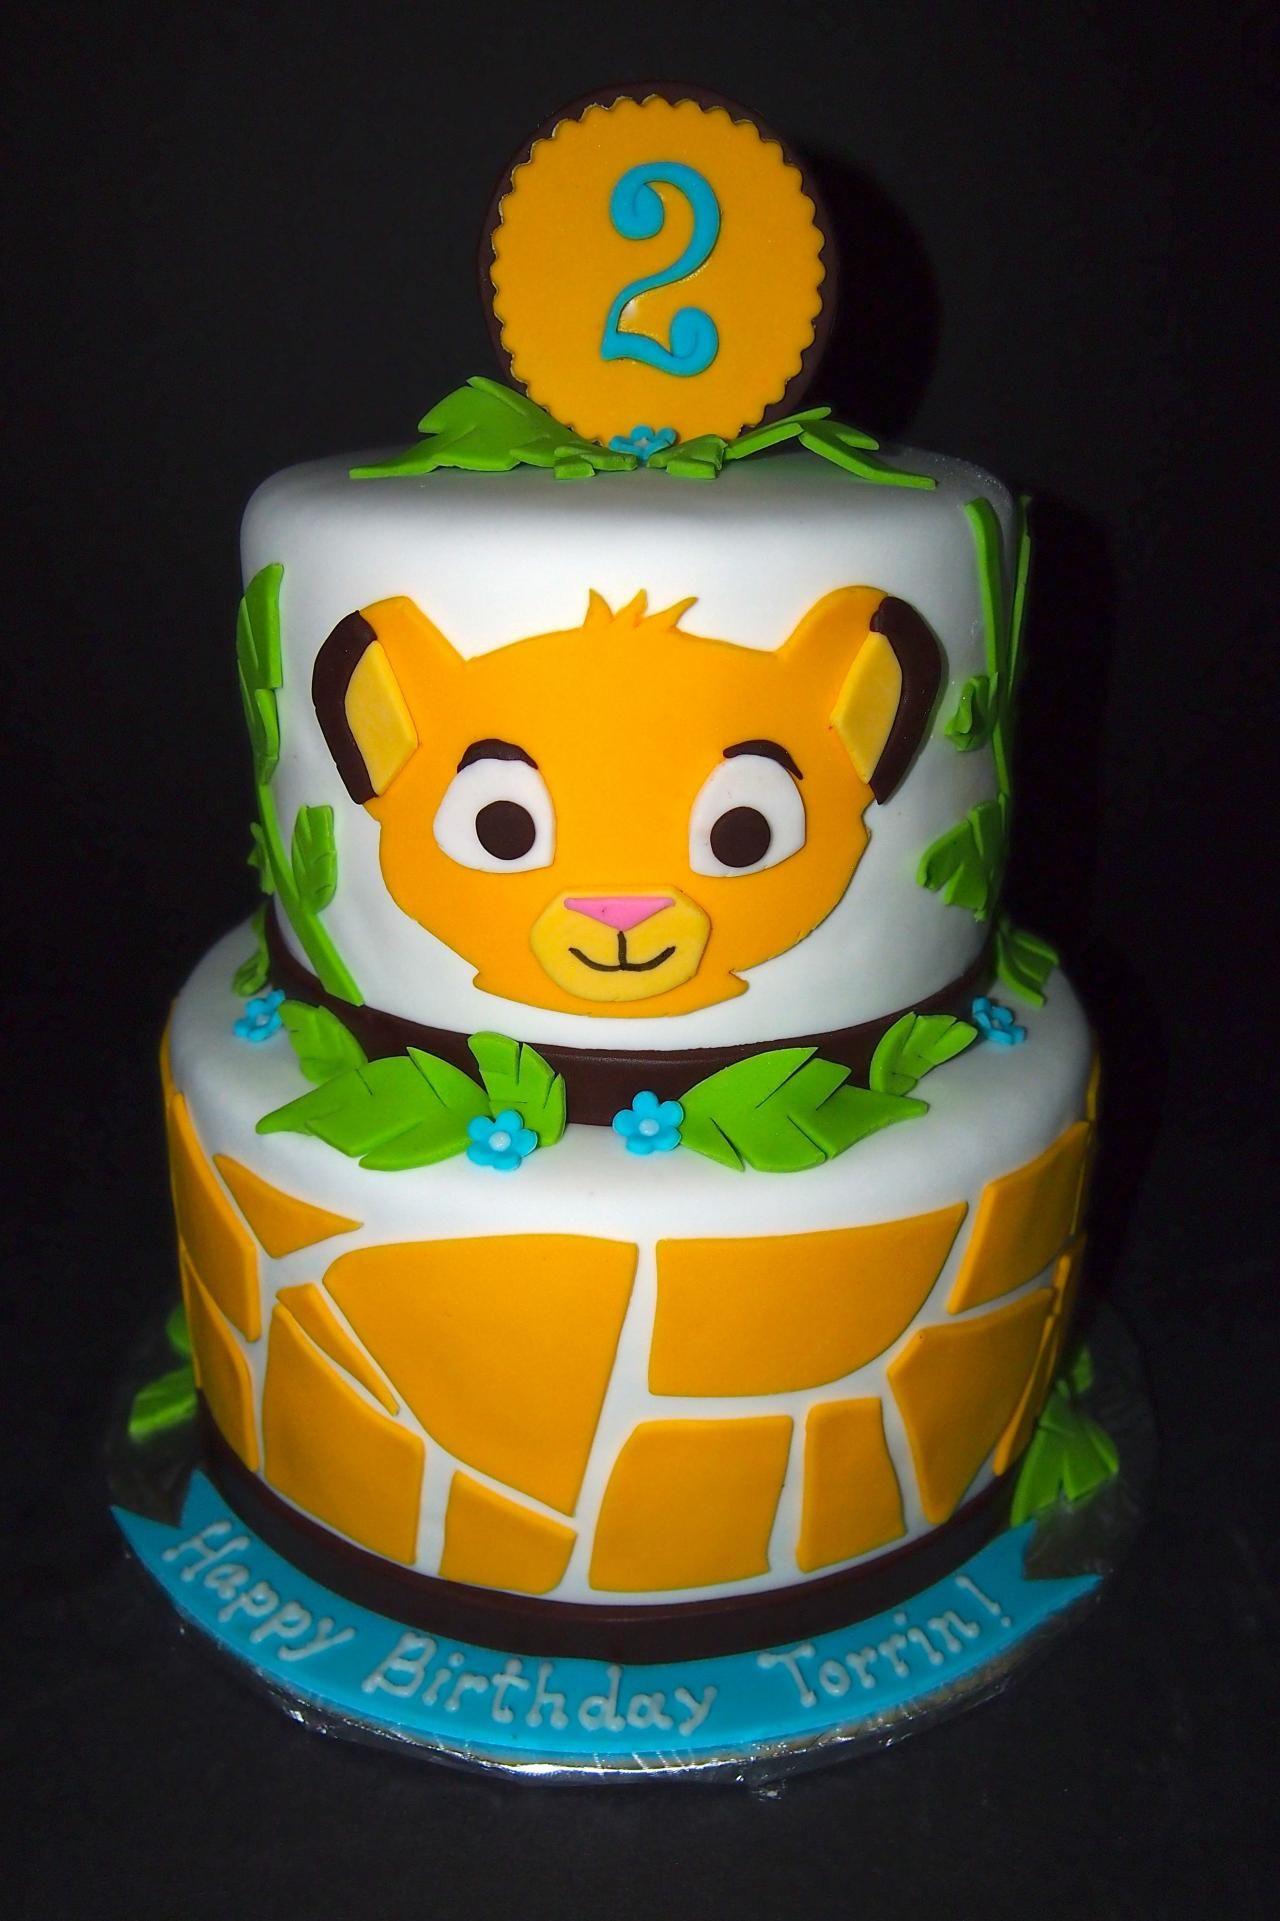 Lion Birthday Cake Lion King Birthday Cake Kempenfelt Cakes - Lion birthday cake design